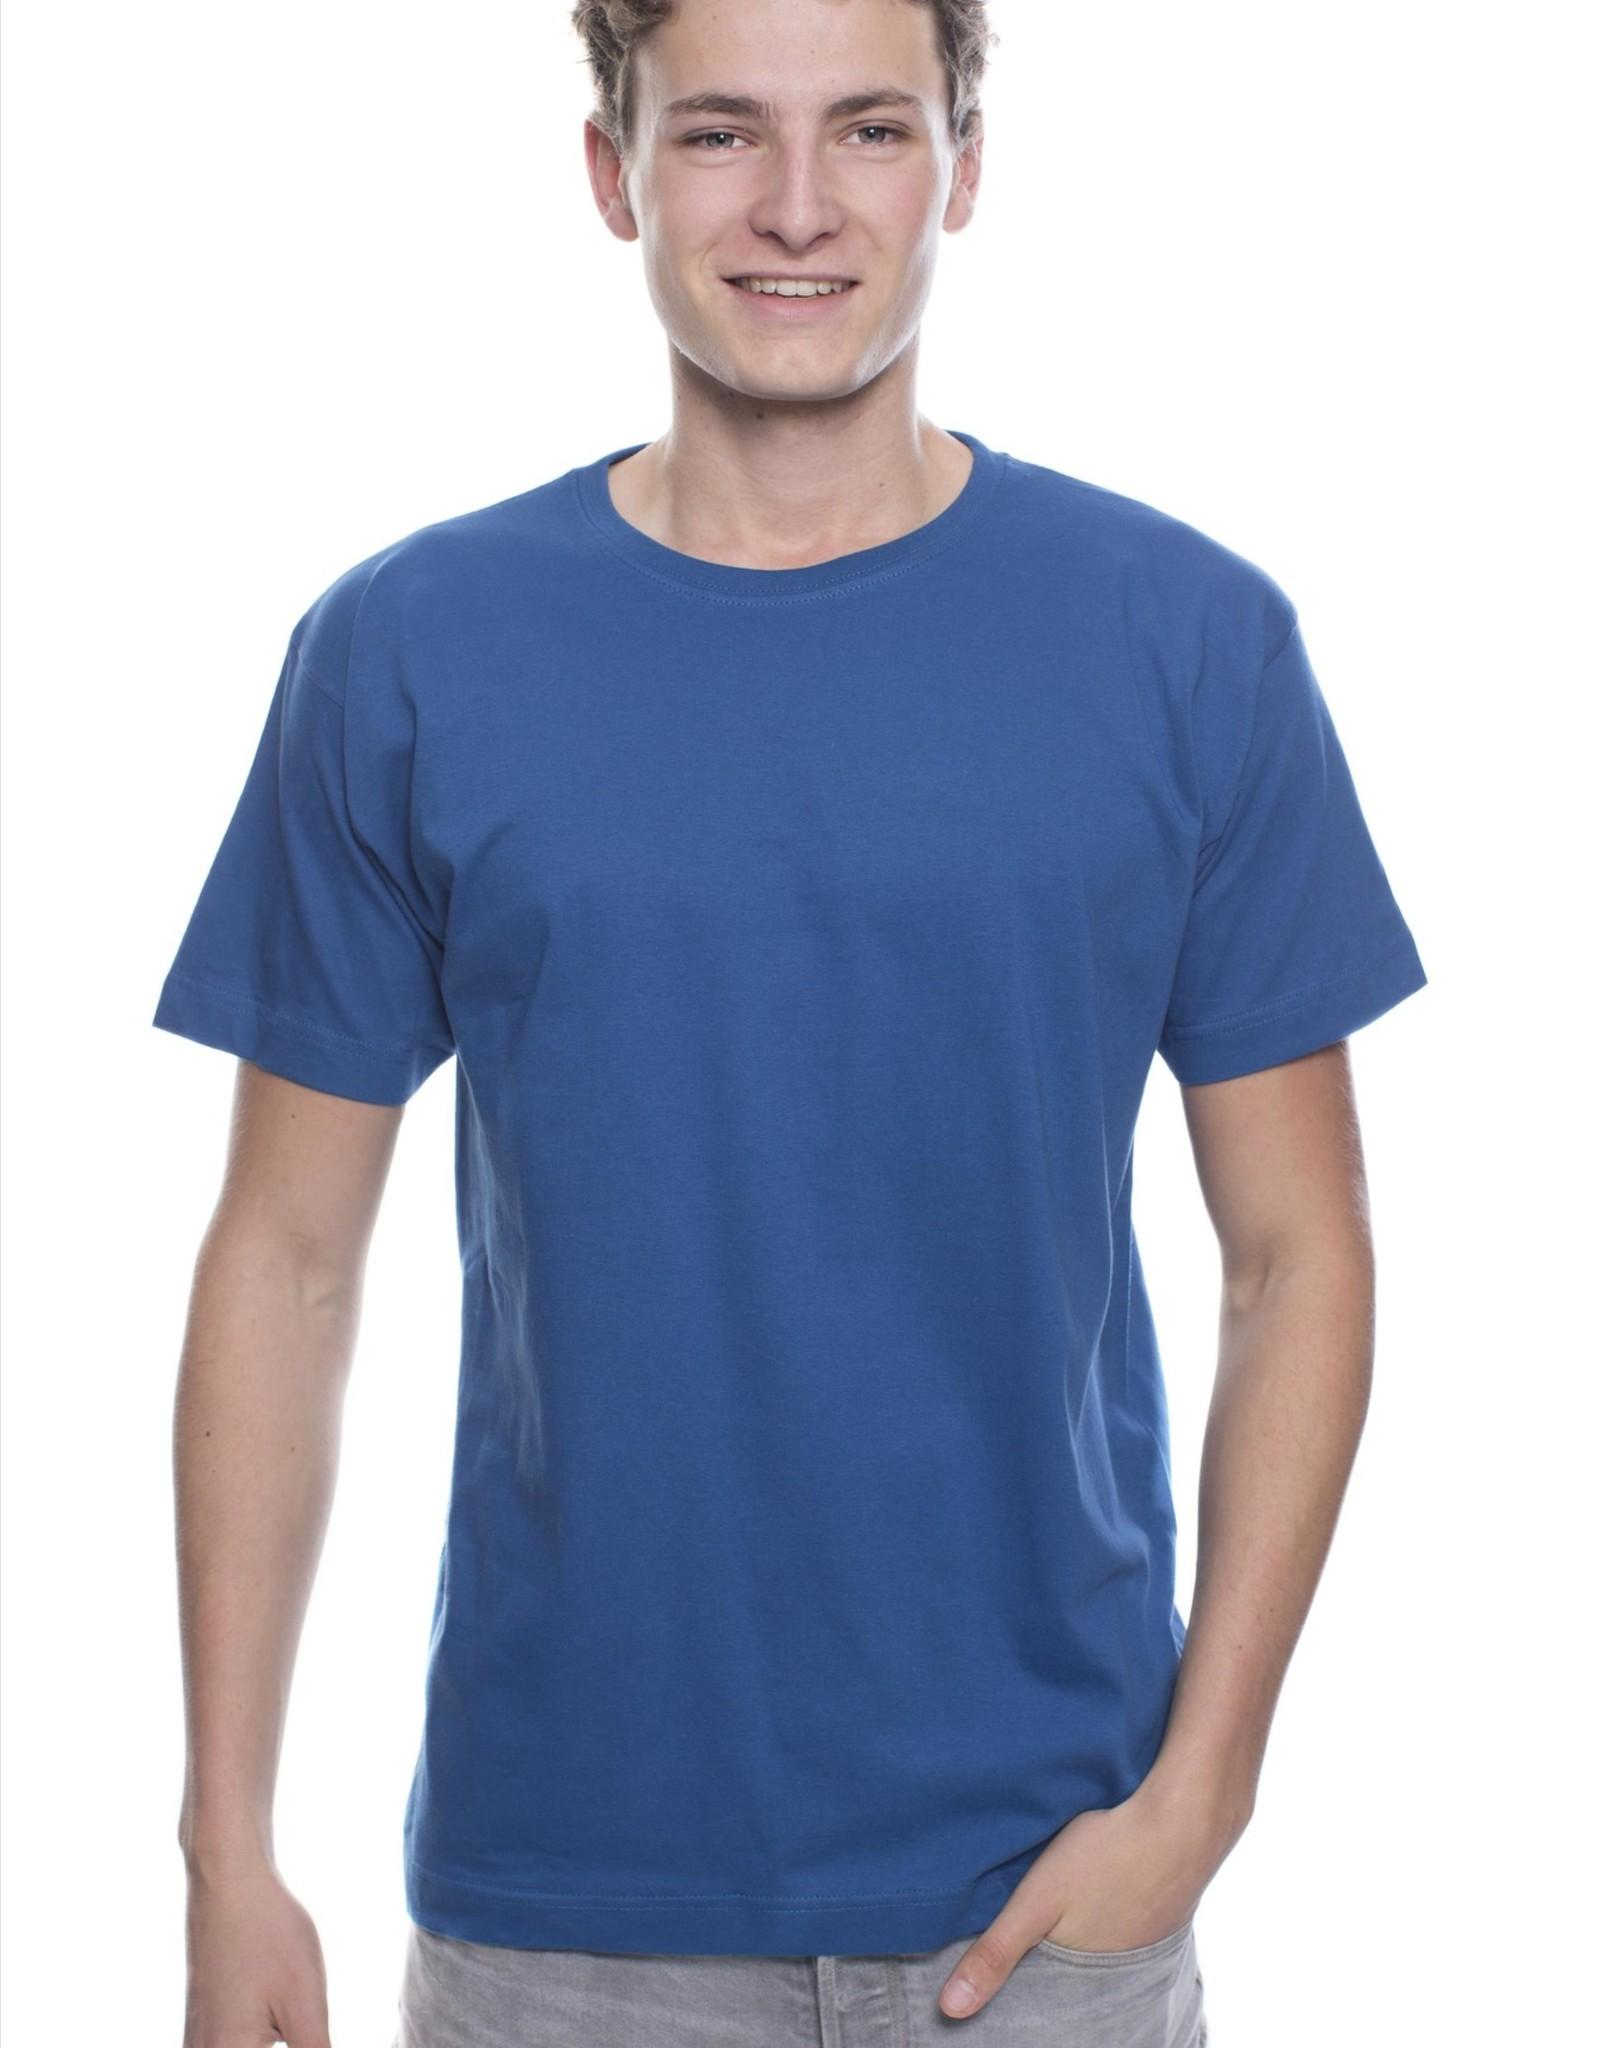 Logostar T-SHIRT basic met ronde hals atoll